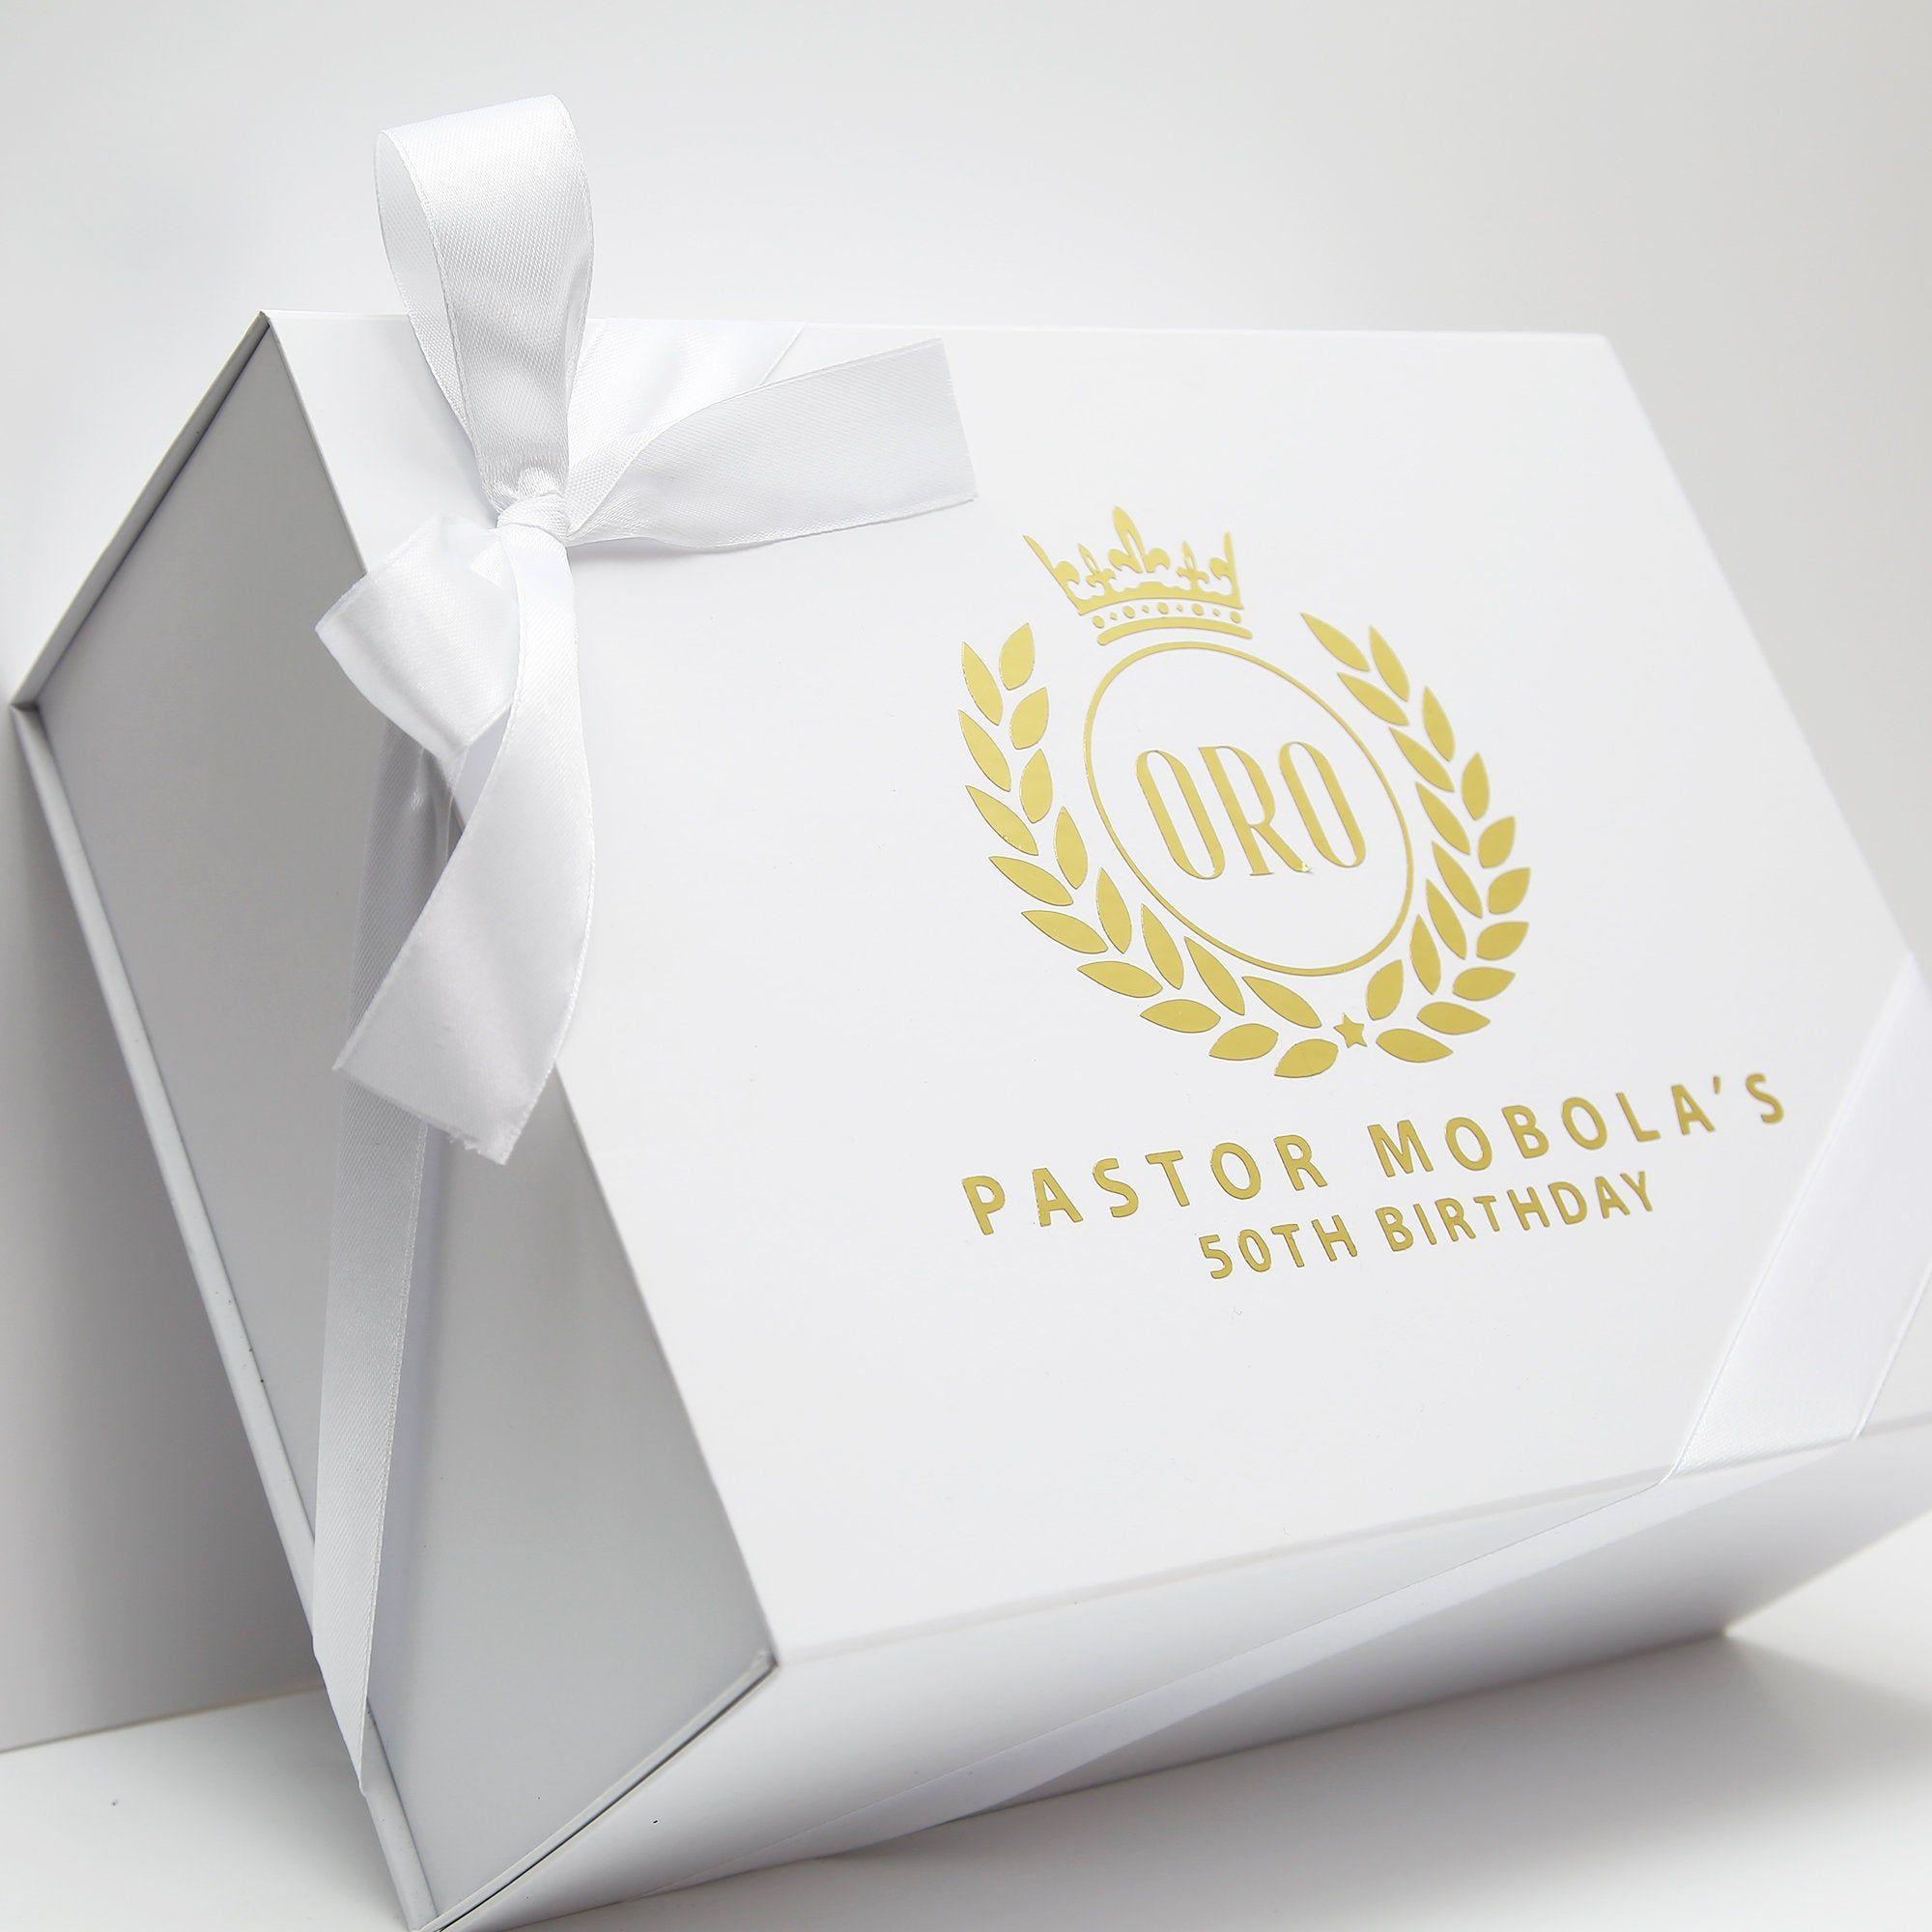 Gift box with logo logo printed shut box etsy